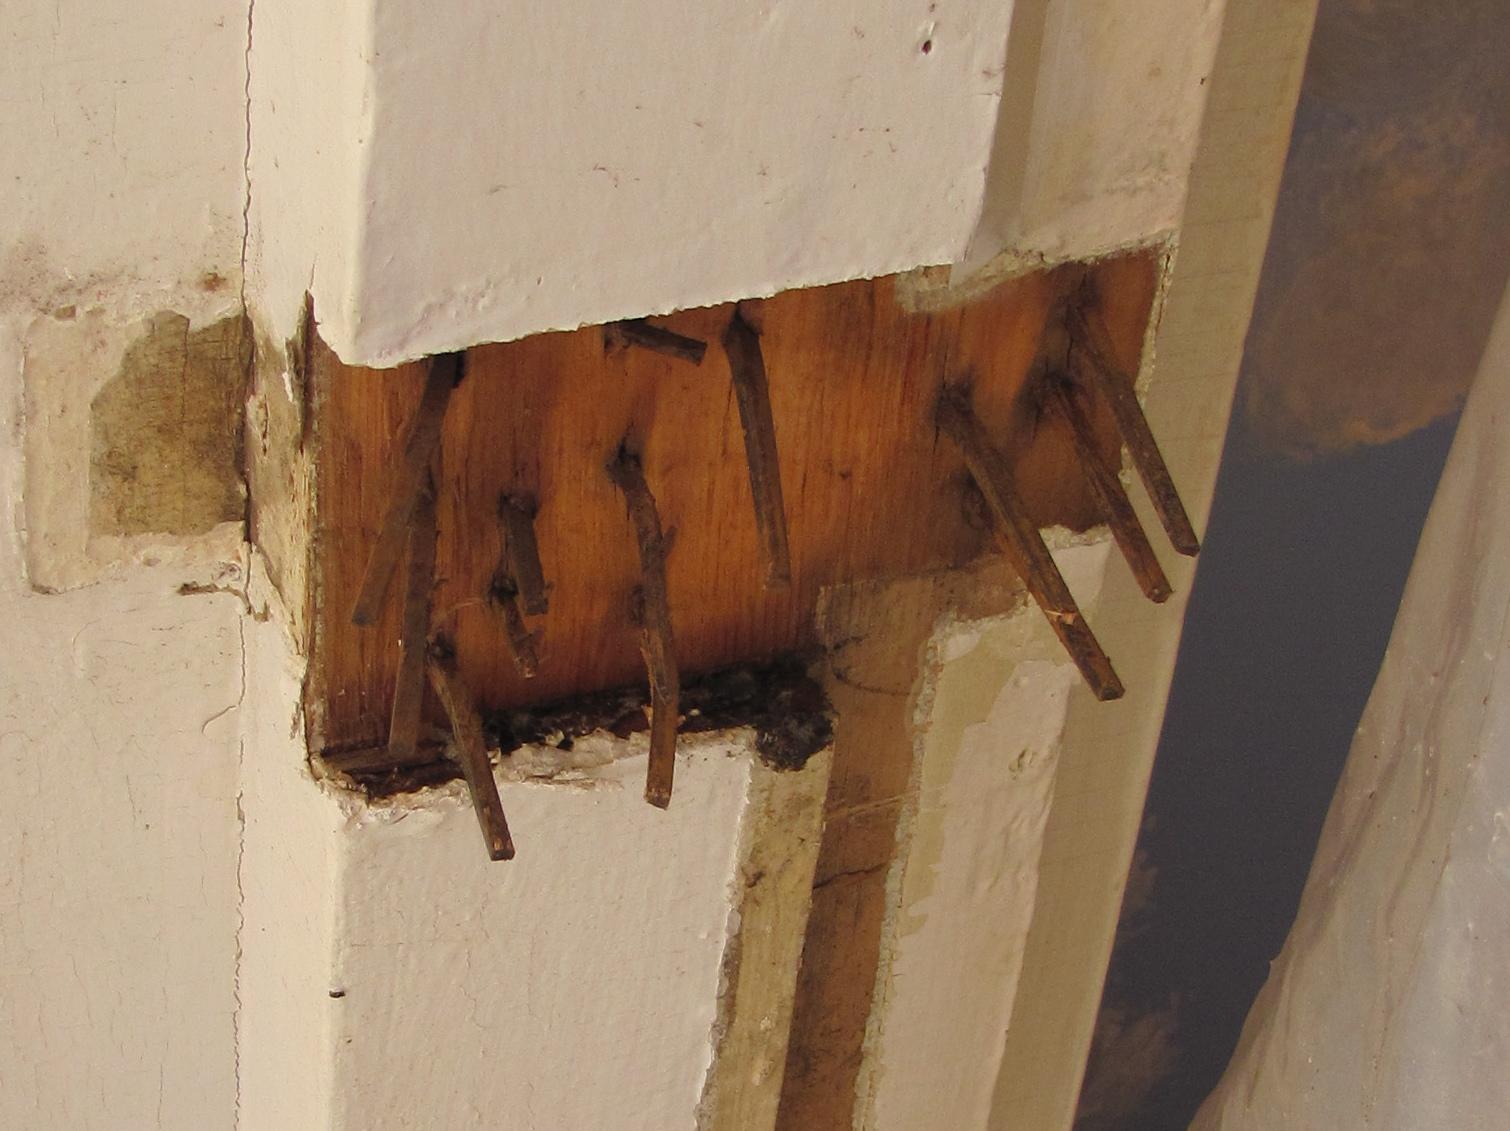 Exterior community of Front Door Thresholds exterior concrete subfloor  | 1510 x 1131 · 560 kB · jpeg